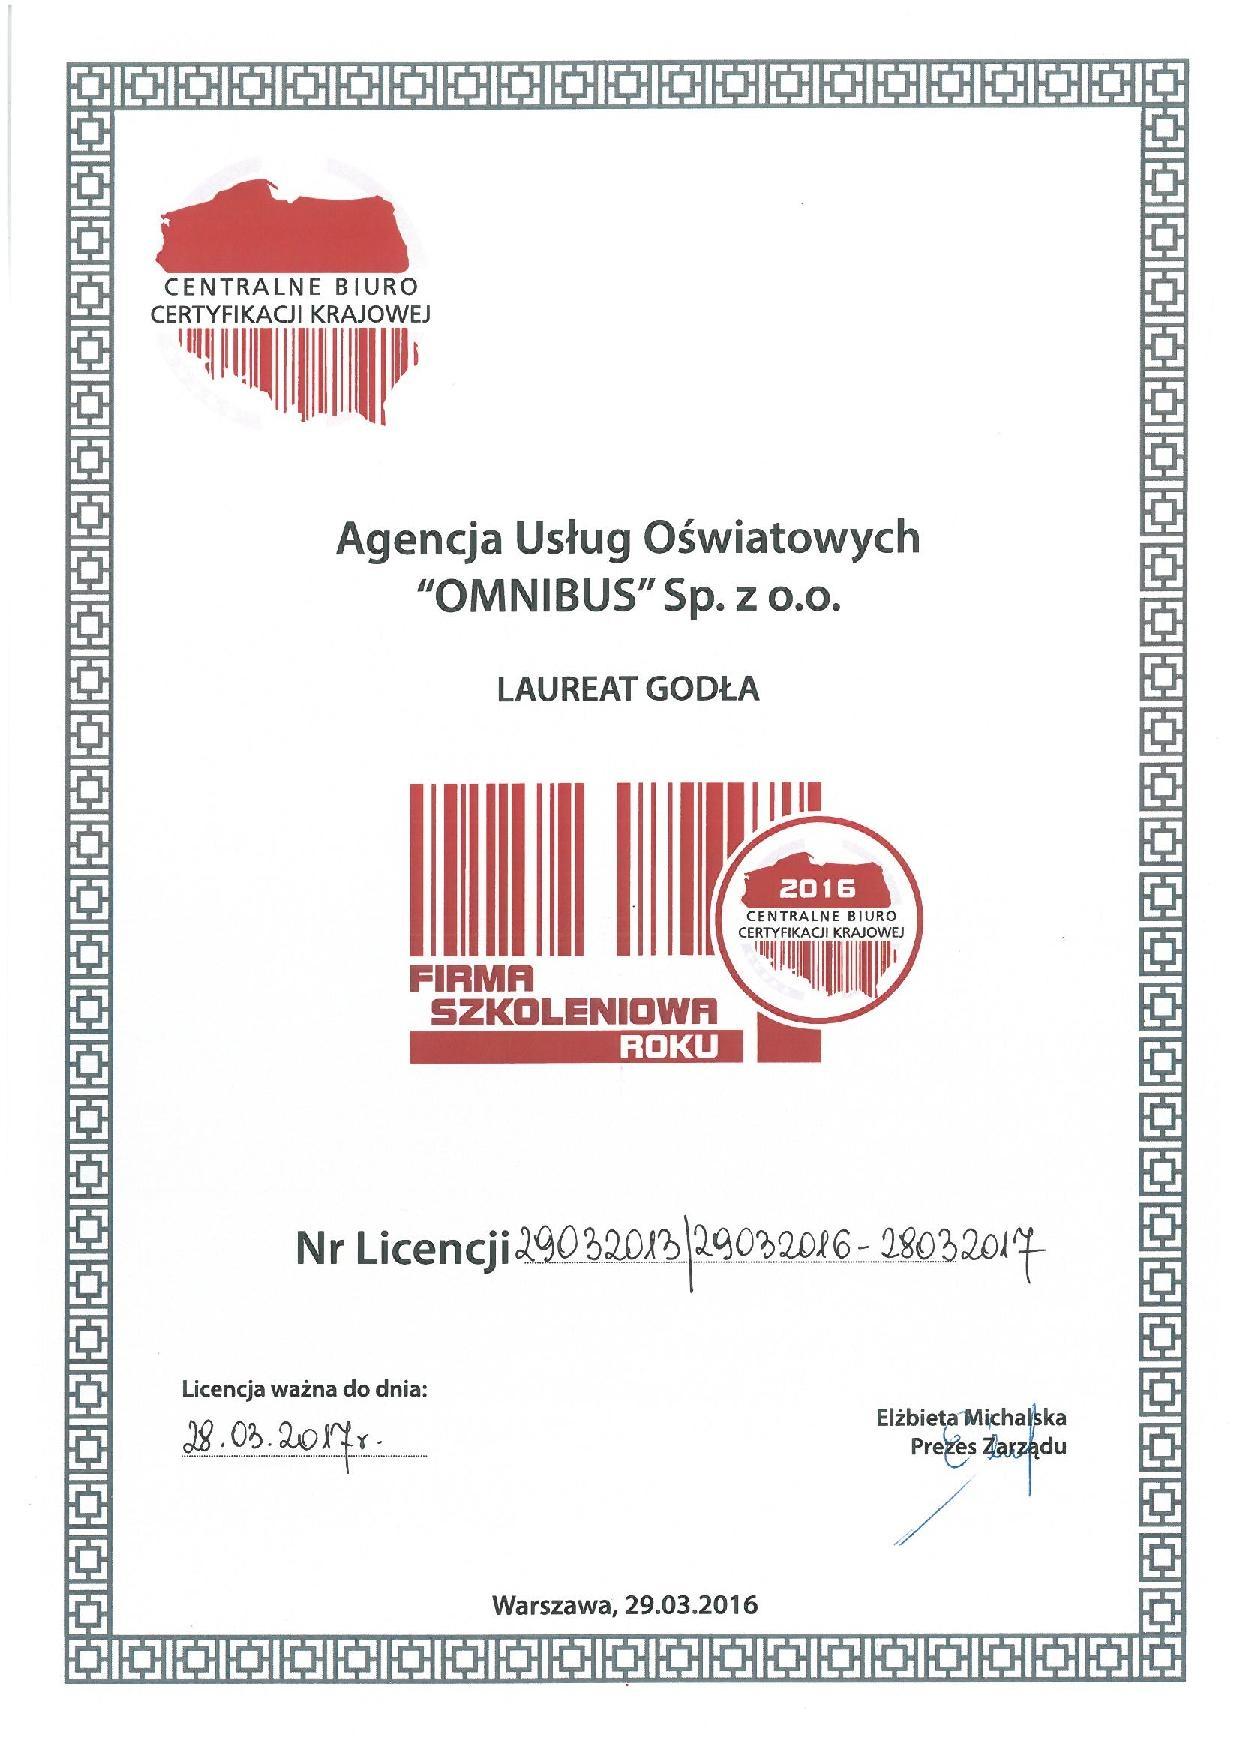 Licencja1